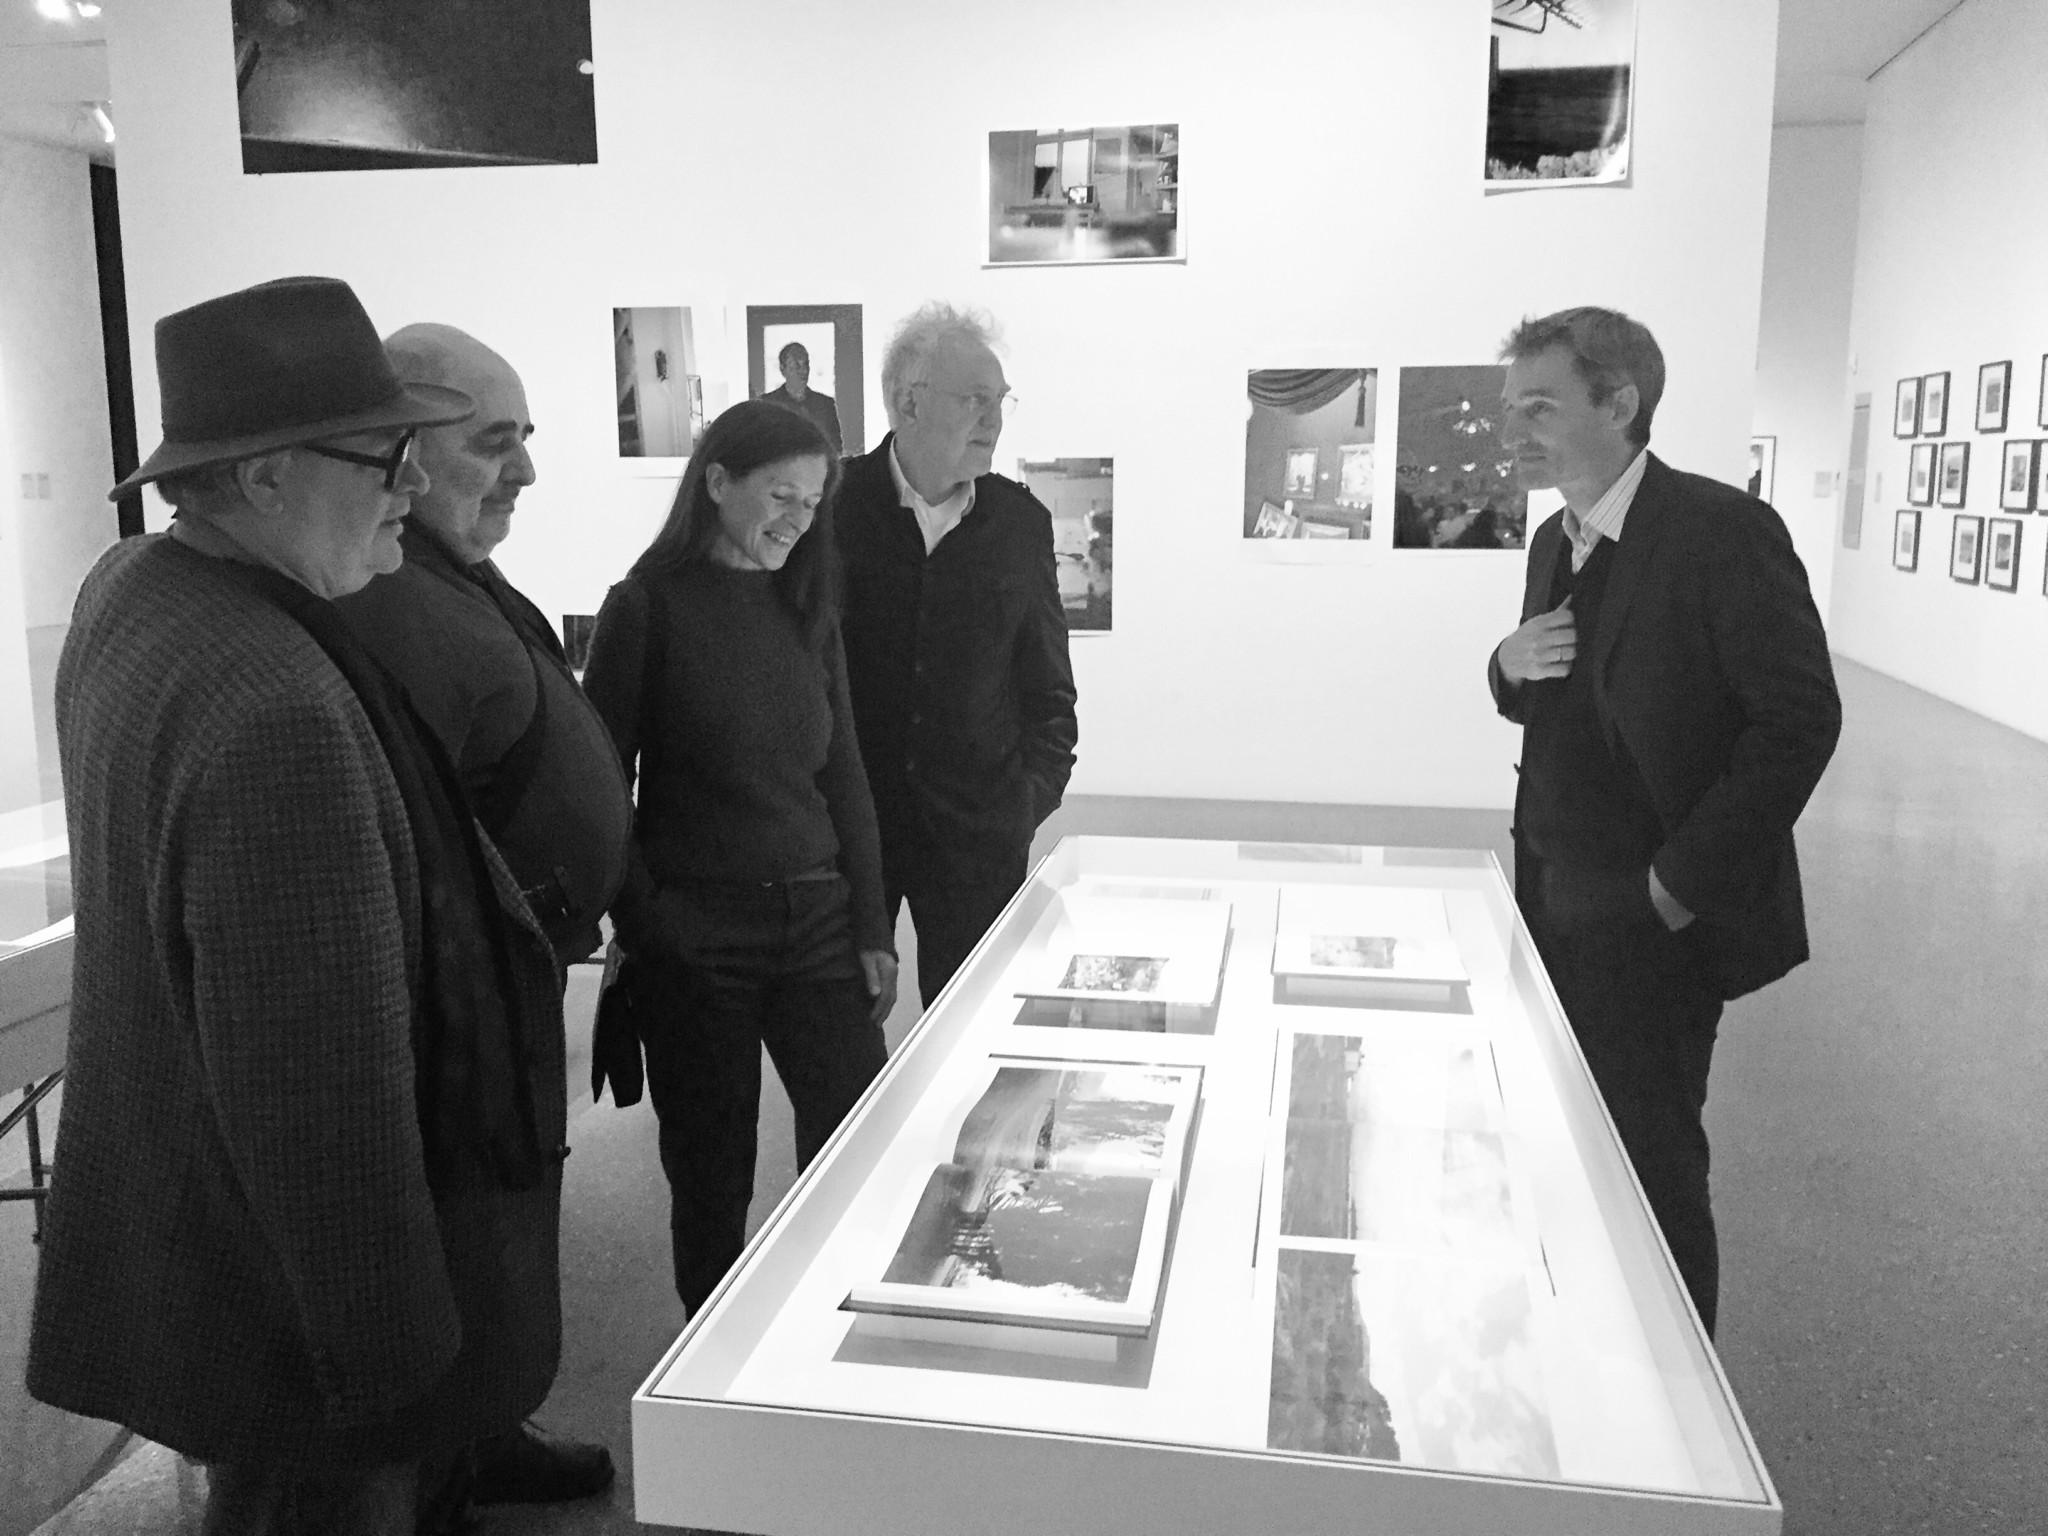 Foto: Peter Liedtke - v.l.n.r. Wilmar Koenig, Volker Heinze, Petra Wittmar, Knut Wolfgang Maron, Florian Ebner